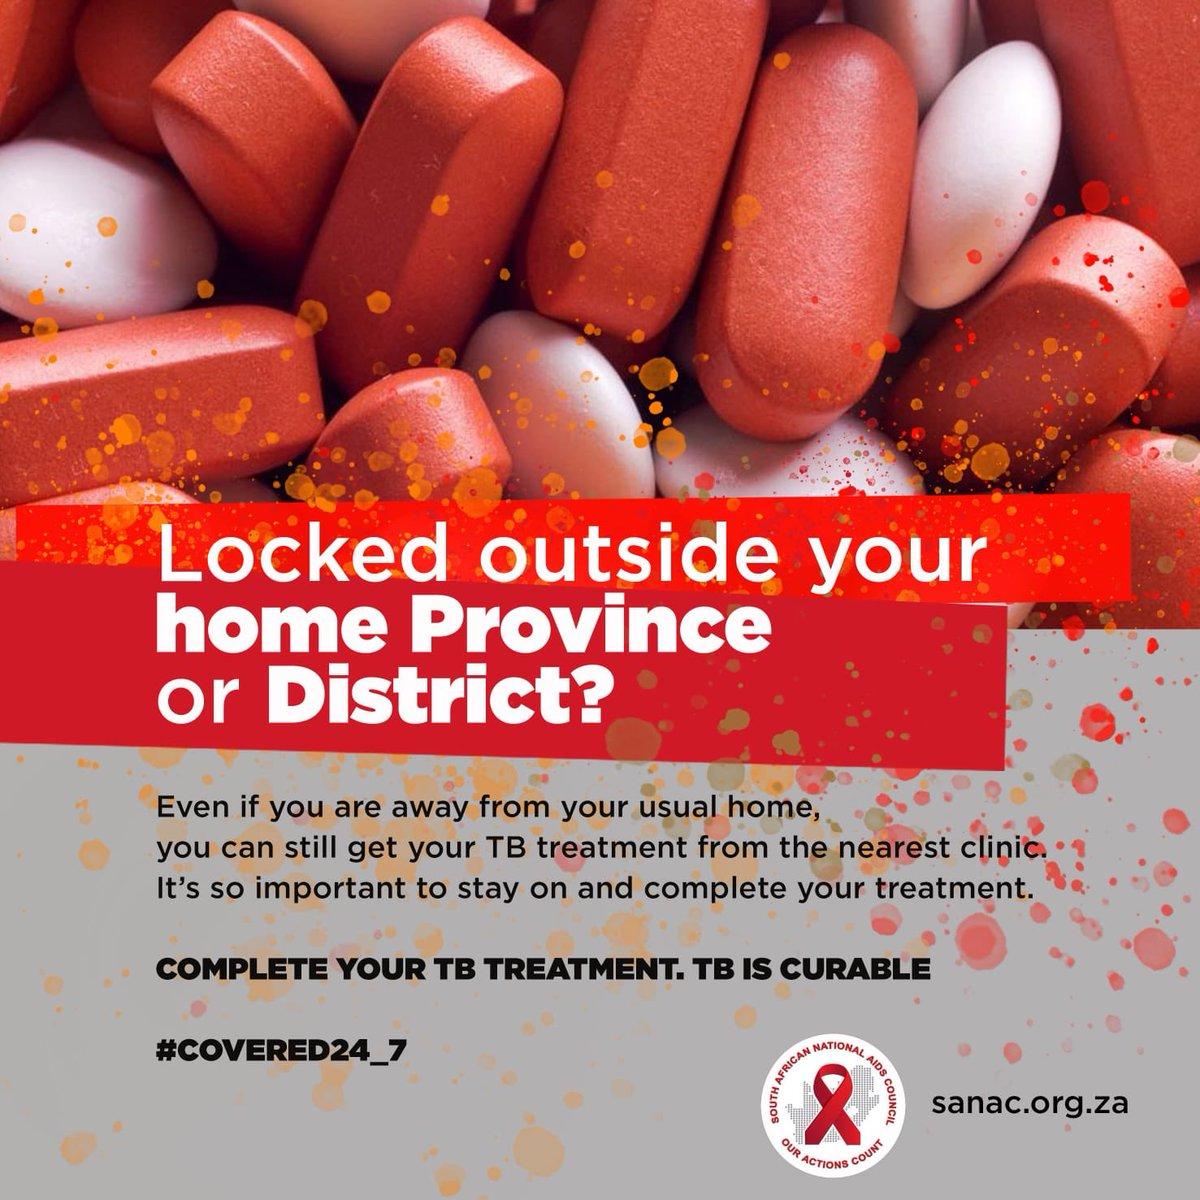 Plz plz stick to them pills u  get help, if u get turned away it can be reported https://t.co/9LrMcRvRAK